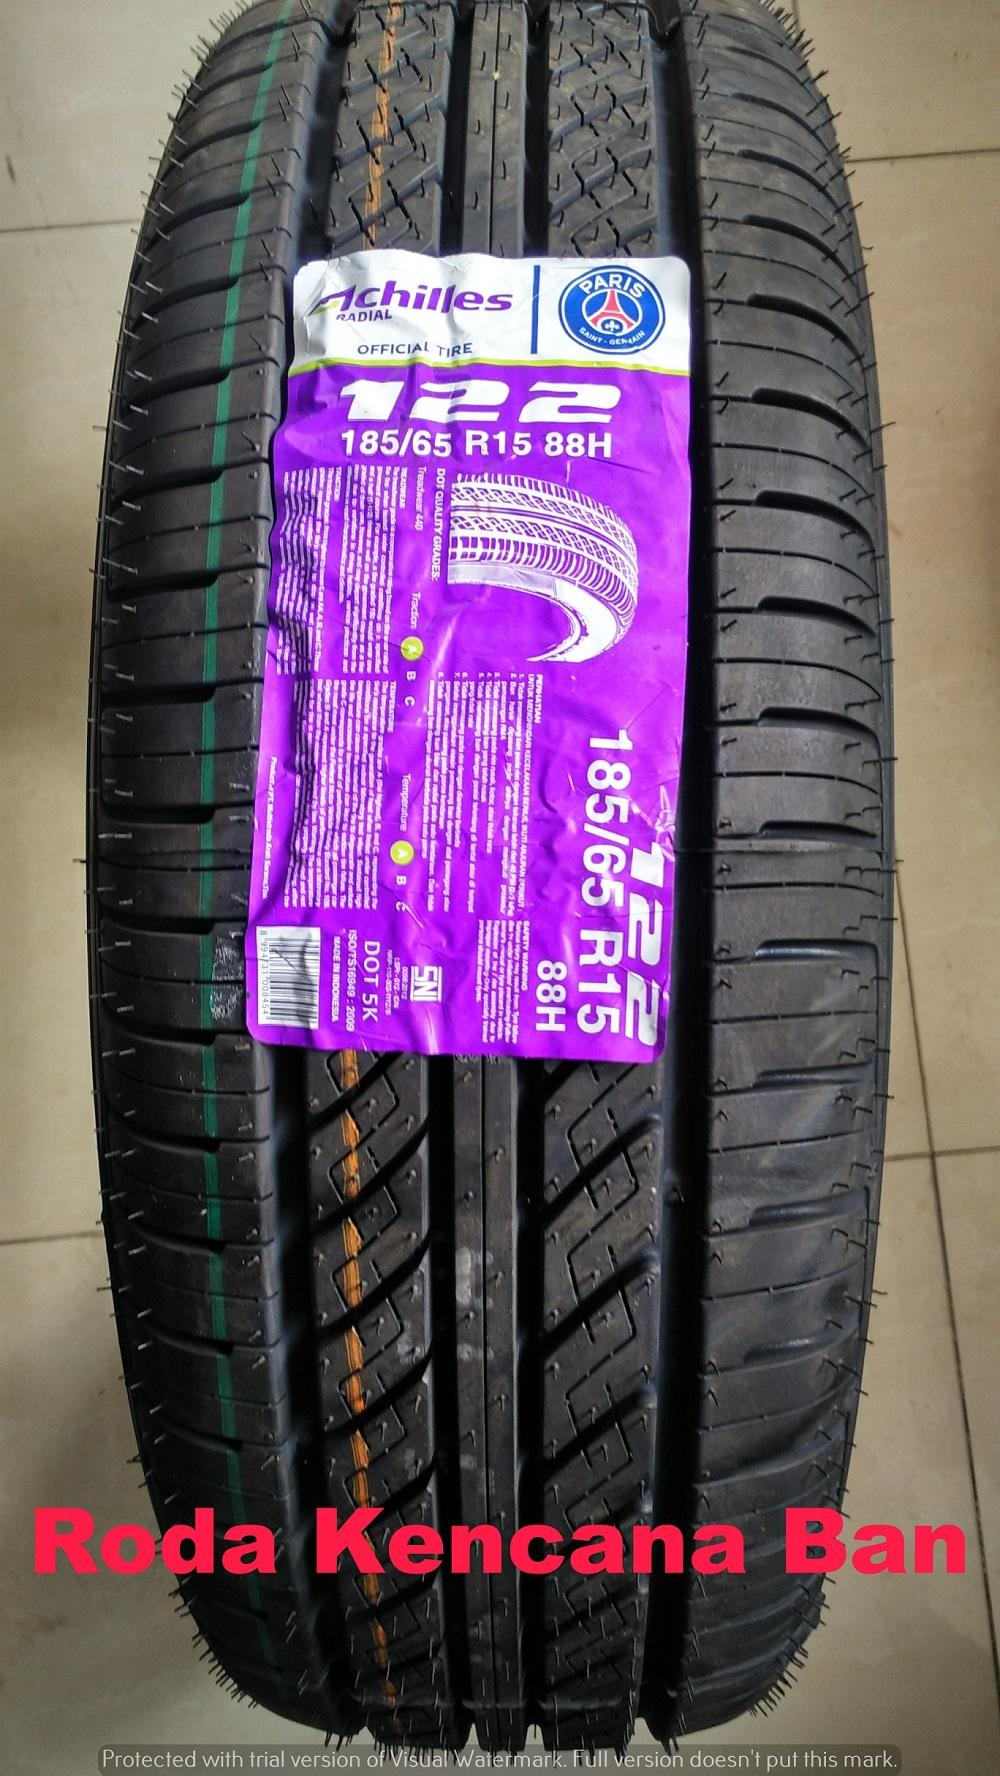 Toko Indonesia Perbandingan Harga Otomotif 65 13 08 18 Ban Mobil Gt Champiro Eco 175 65r14 Vocer Achilles 122 185 R15